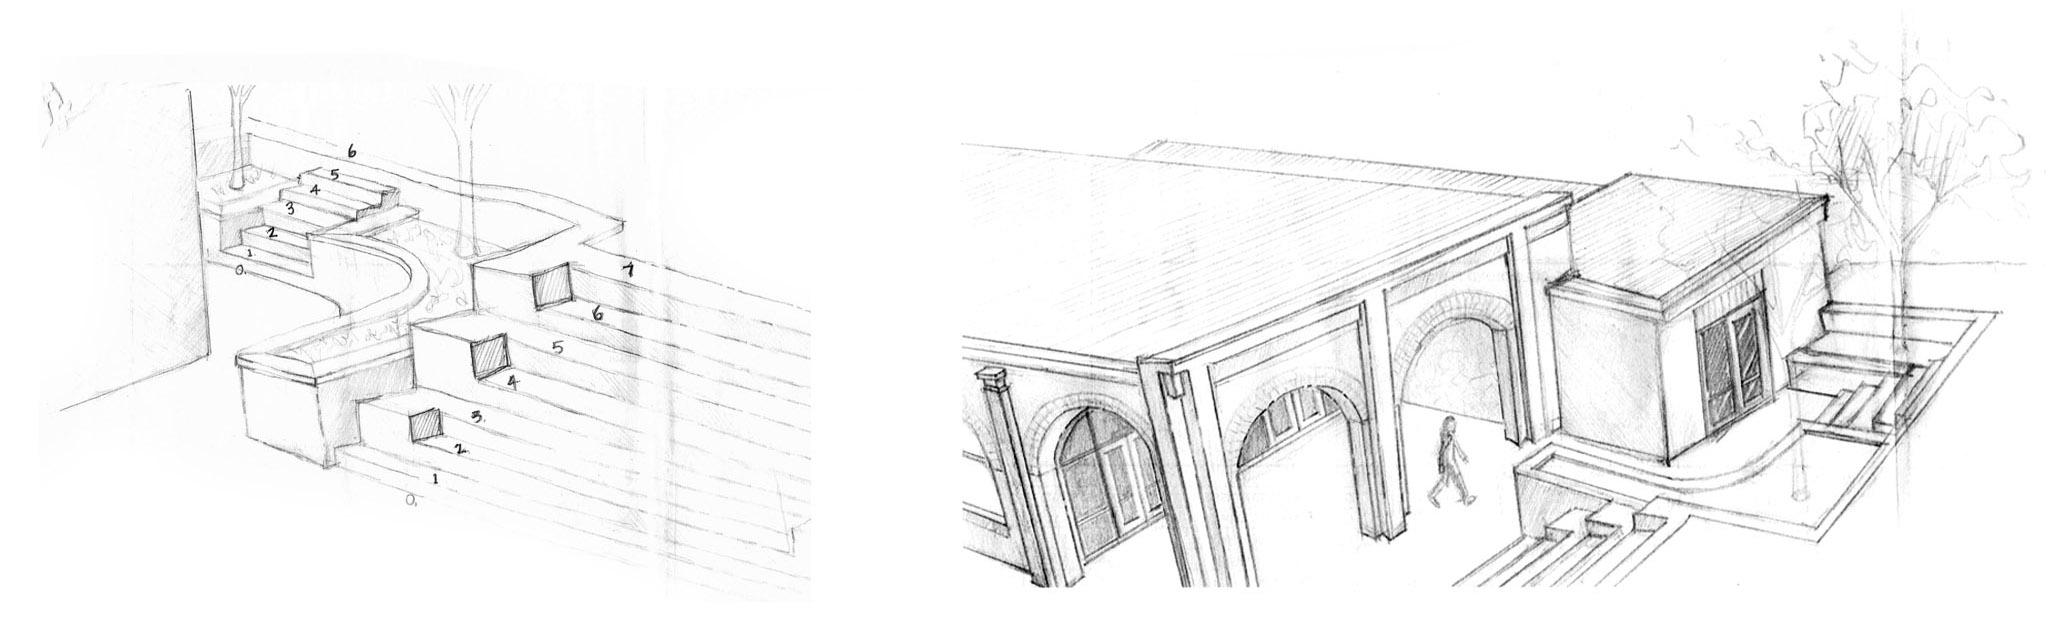 fireplace and landscape-3.jpg